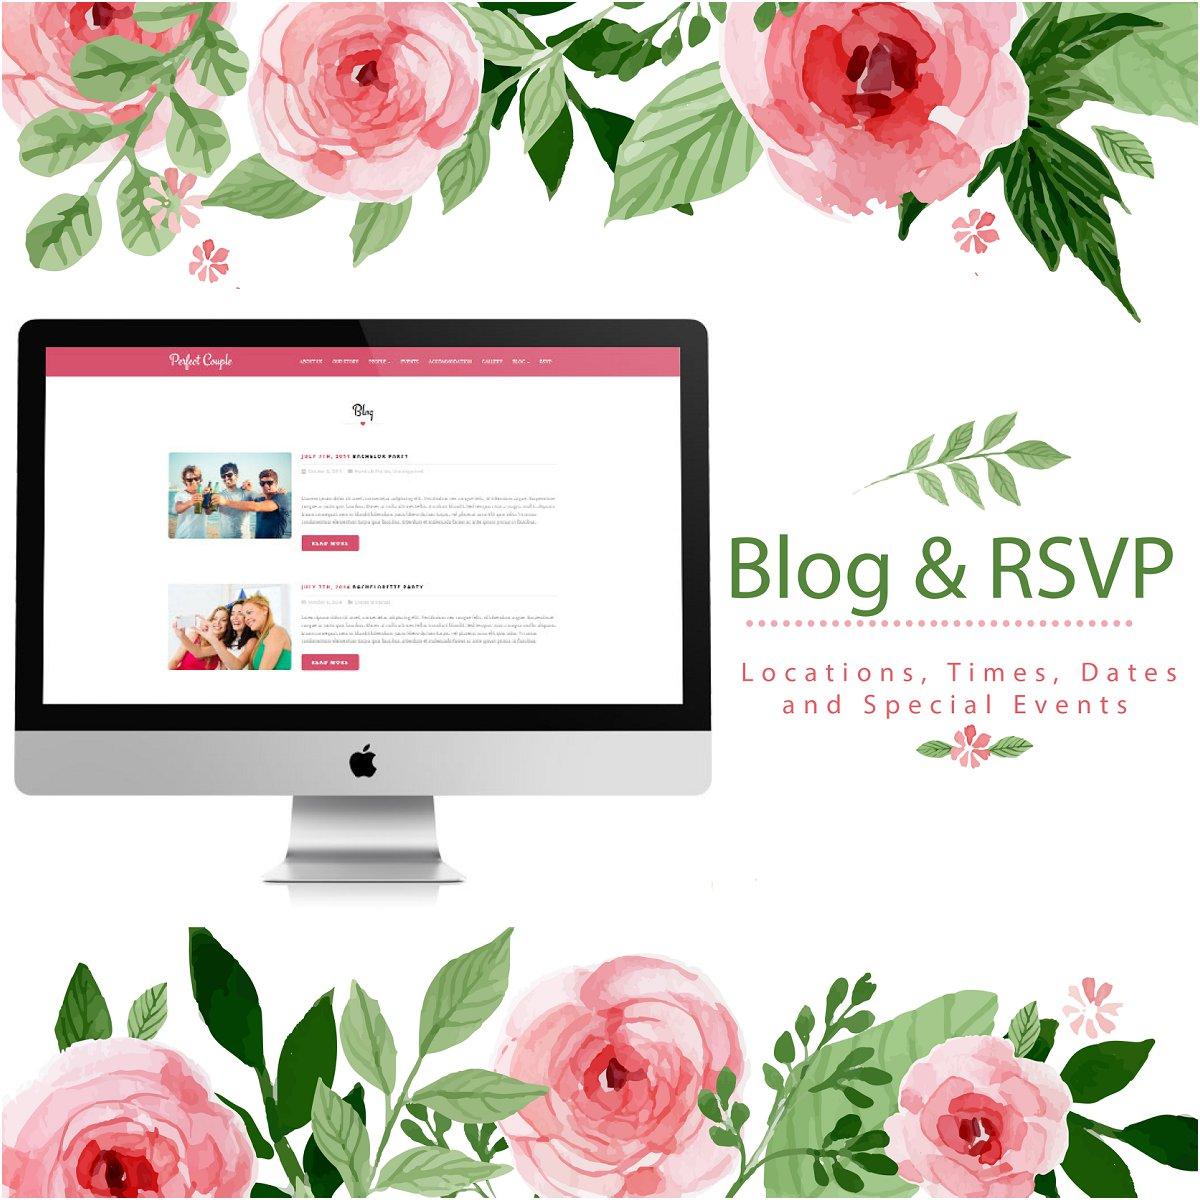 Blog&RSVP